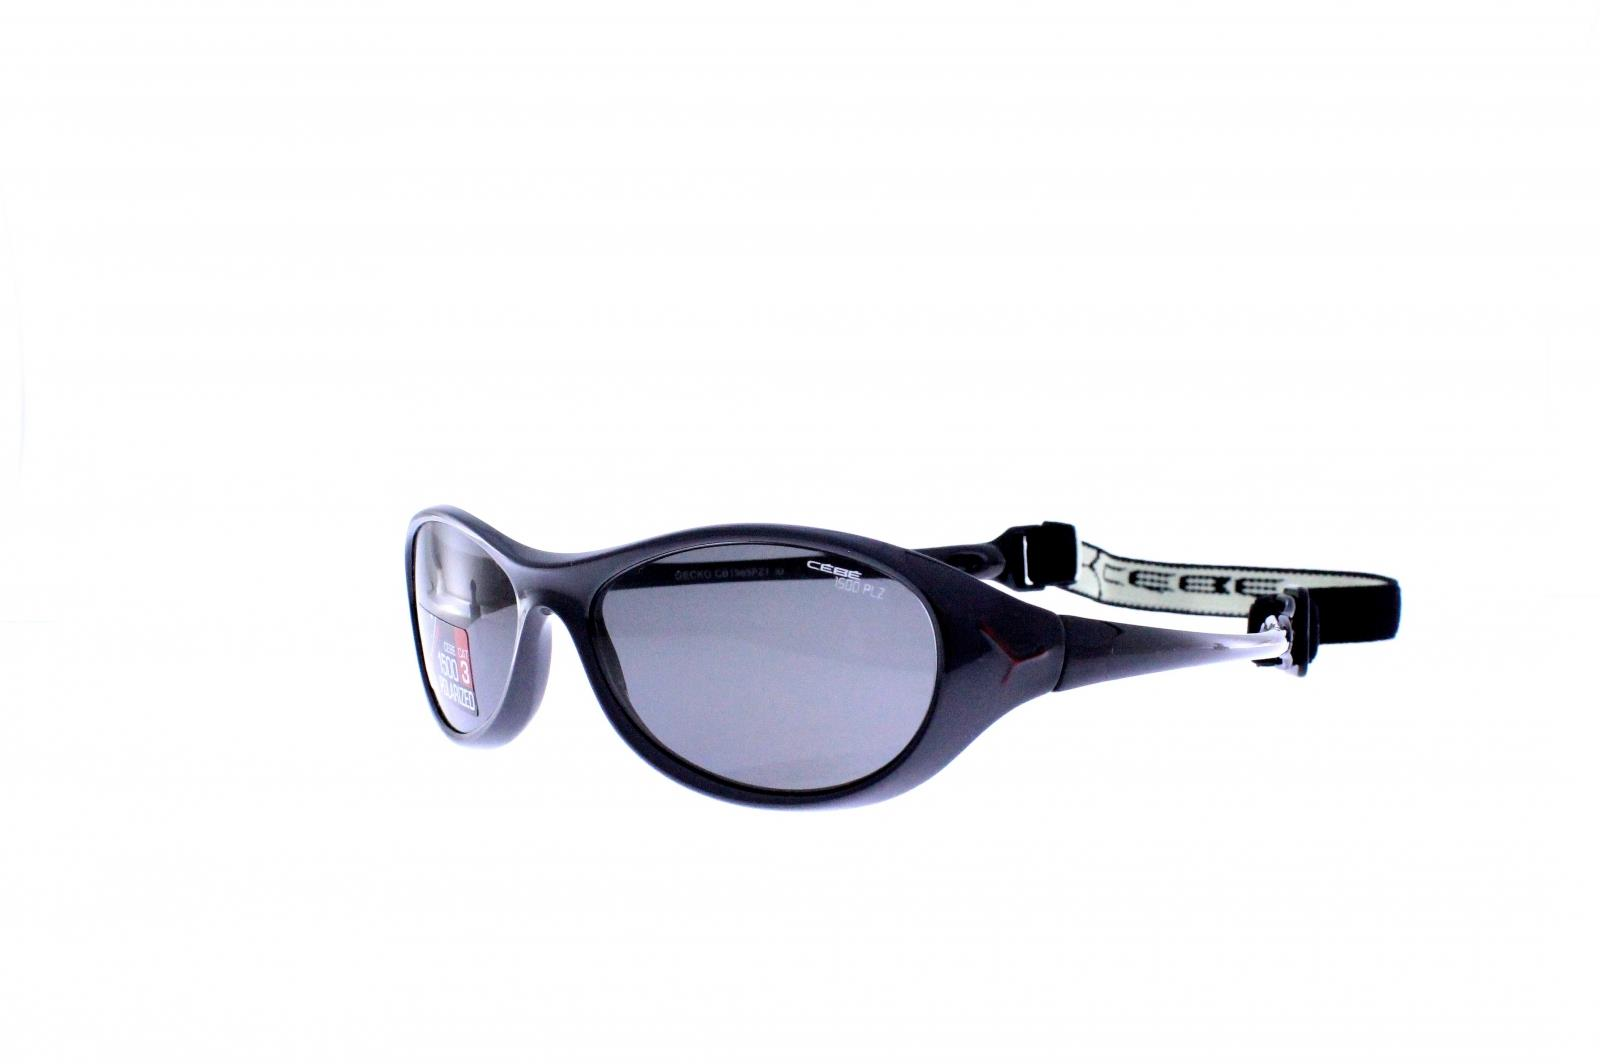 Cebe Gecko Güneş Gözlük Parlak Glosy Siyah 1500 Grey Cb1985Pz1